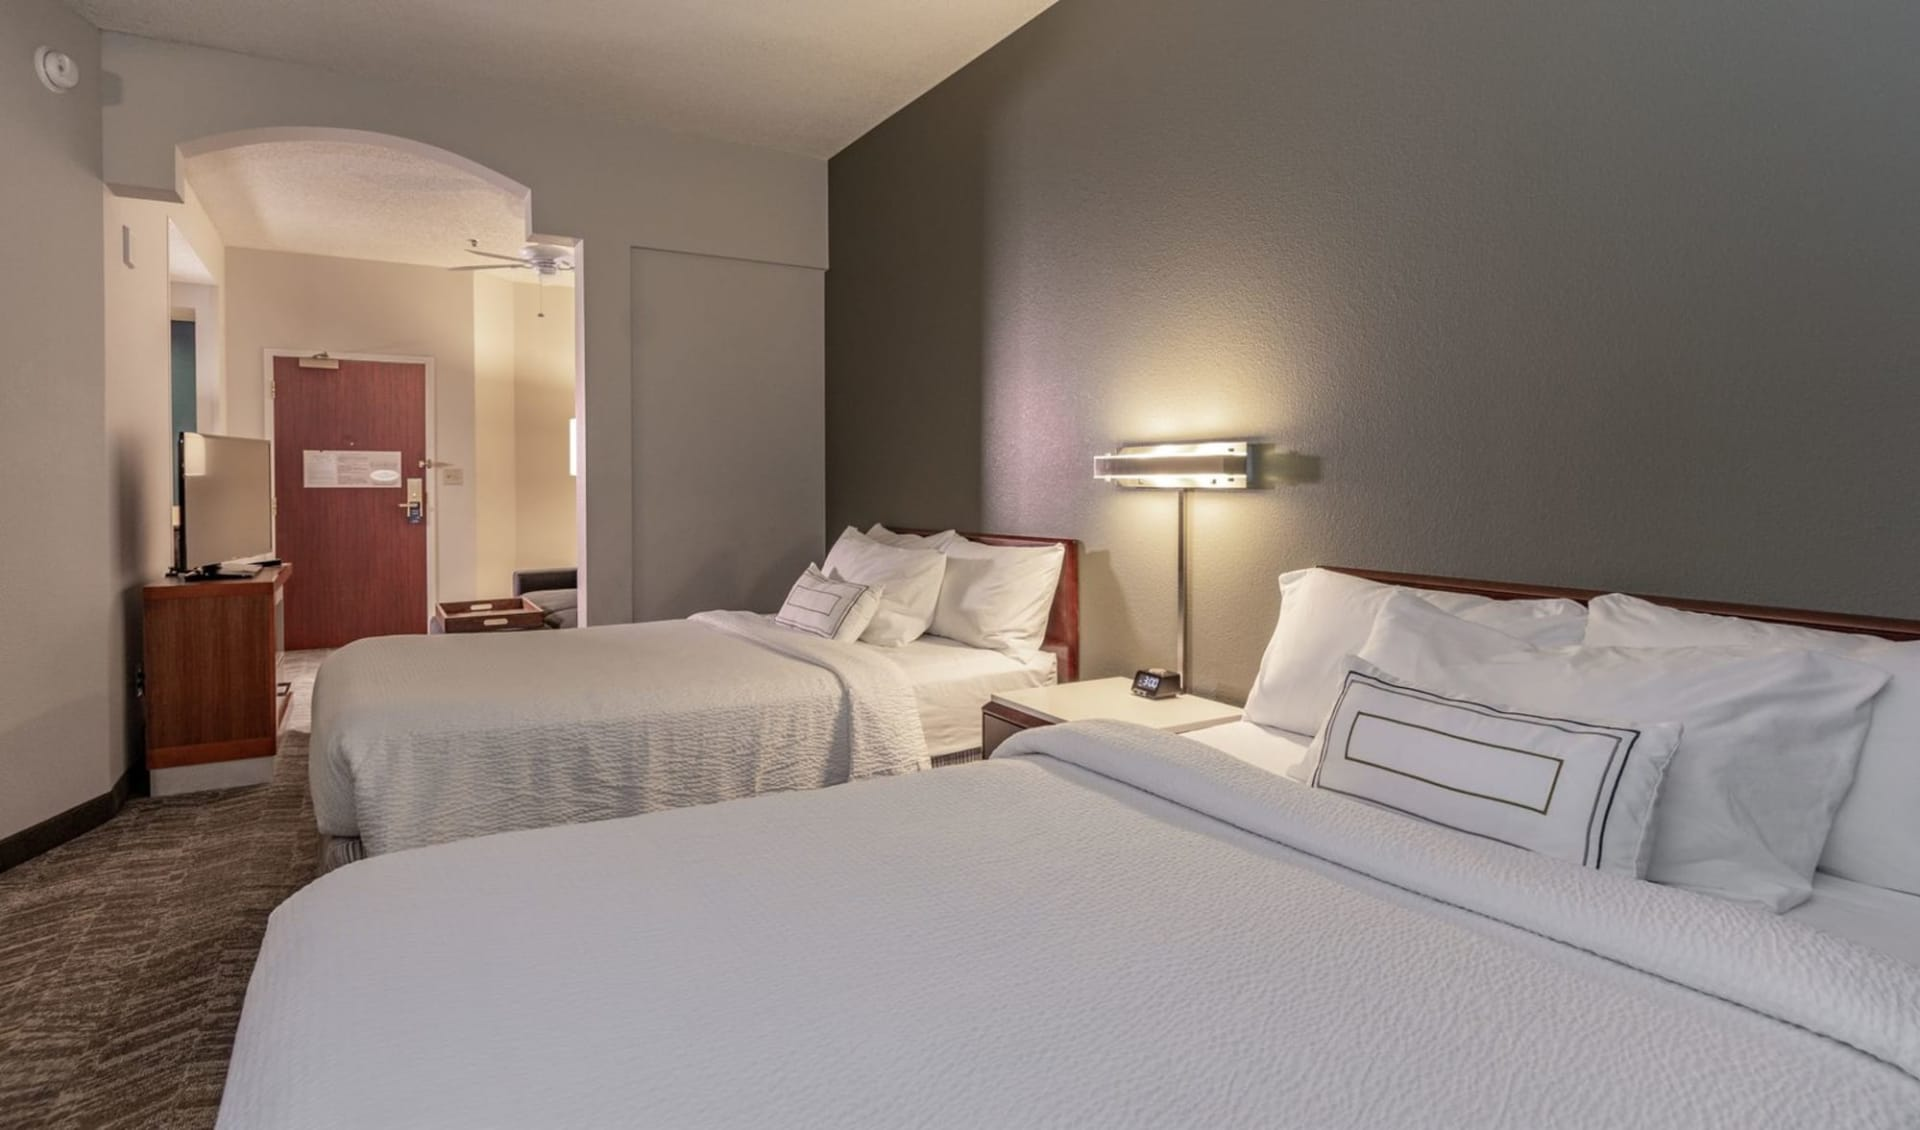 Springhill Suites Fairbanks: springhill_suites_fairbanks_2 beds standard room 02